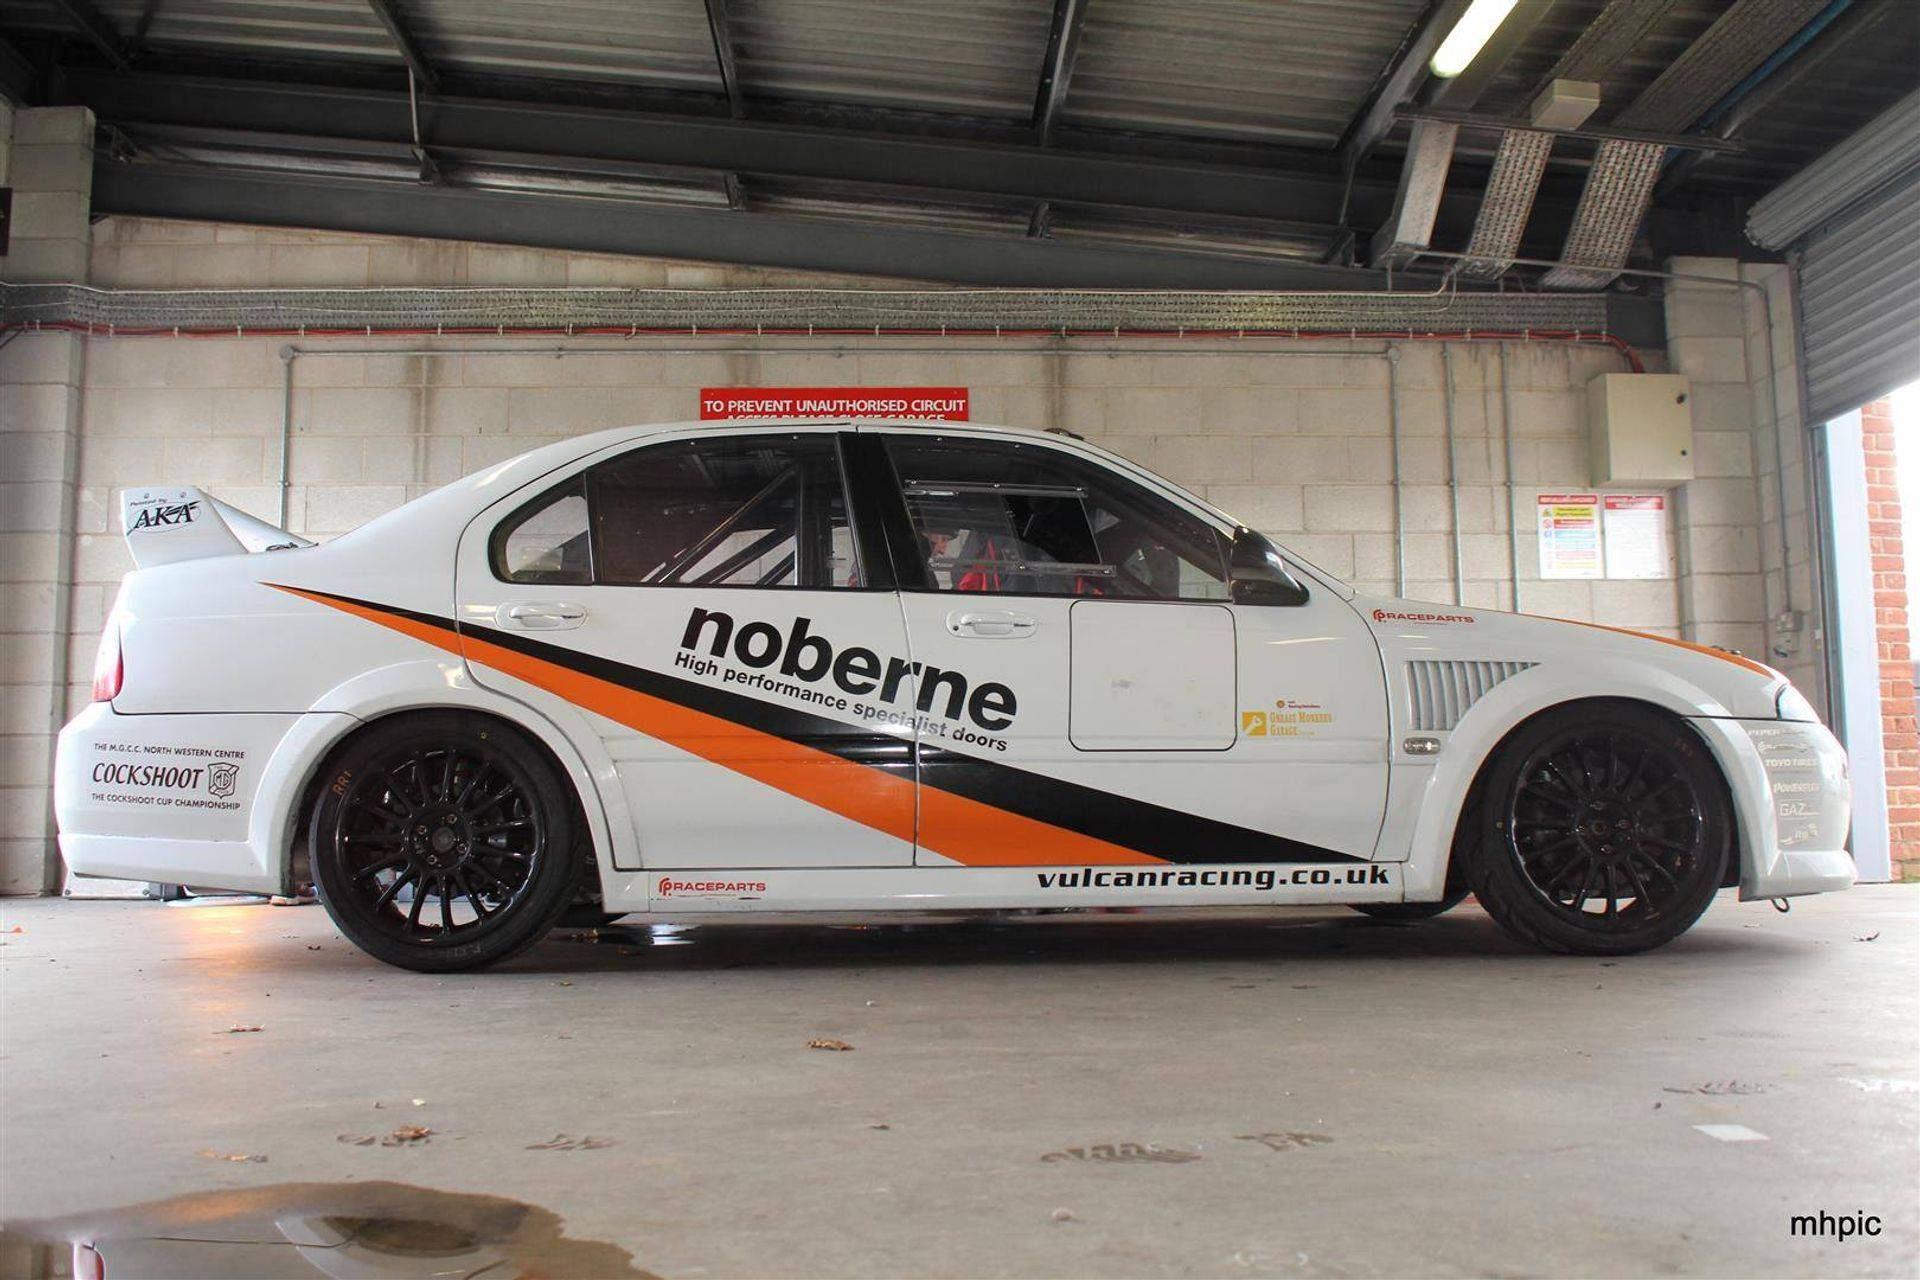 MGZS V6 180 Race Car Vulcan Racing Race Car - Oulton Park Testing